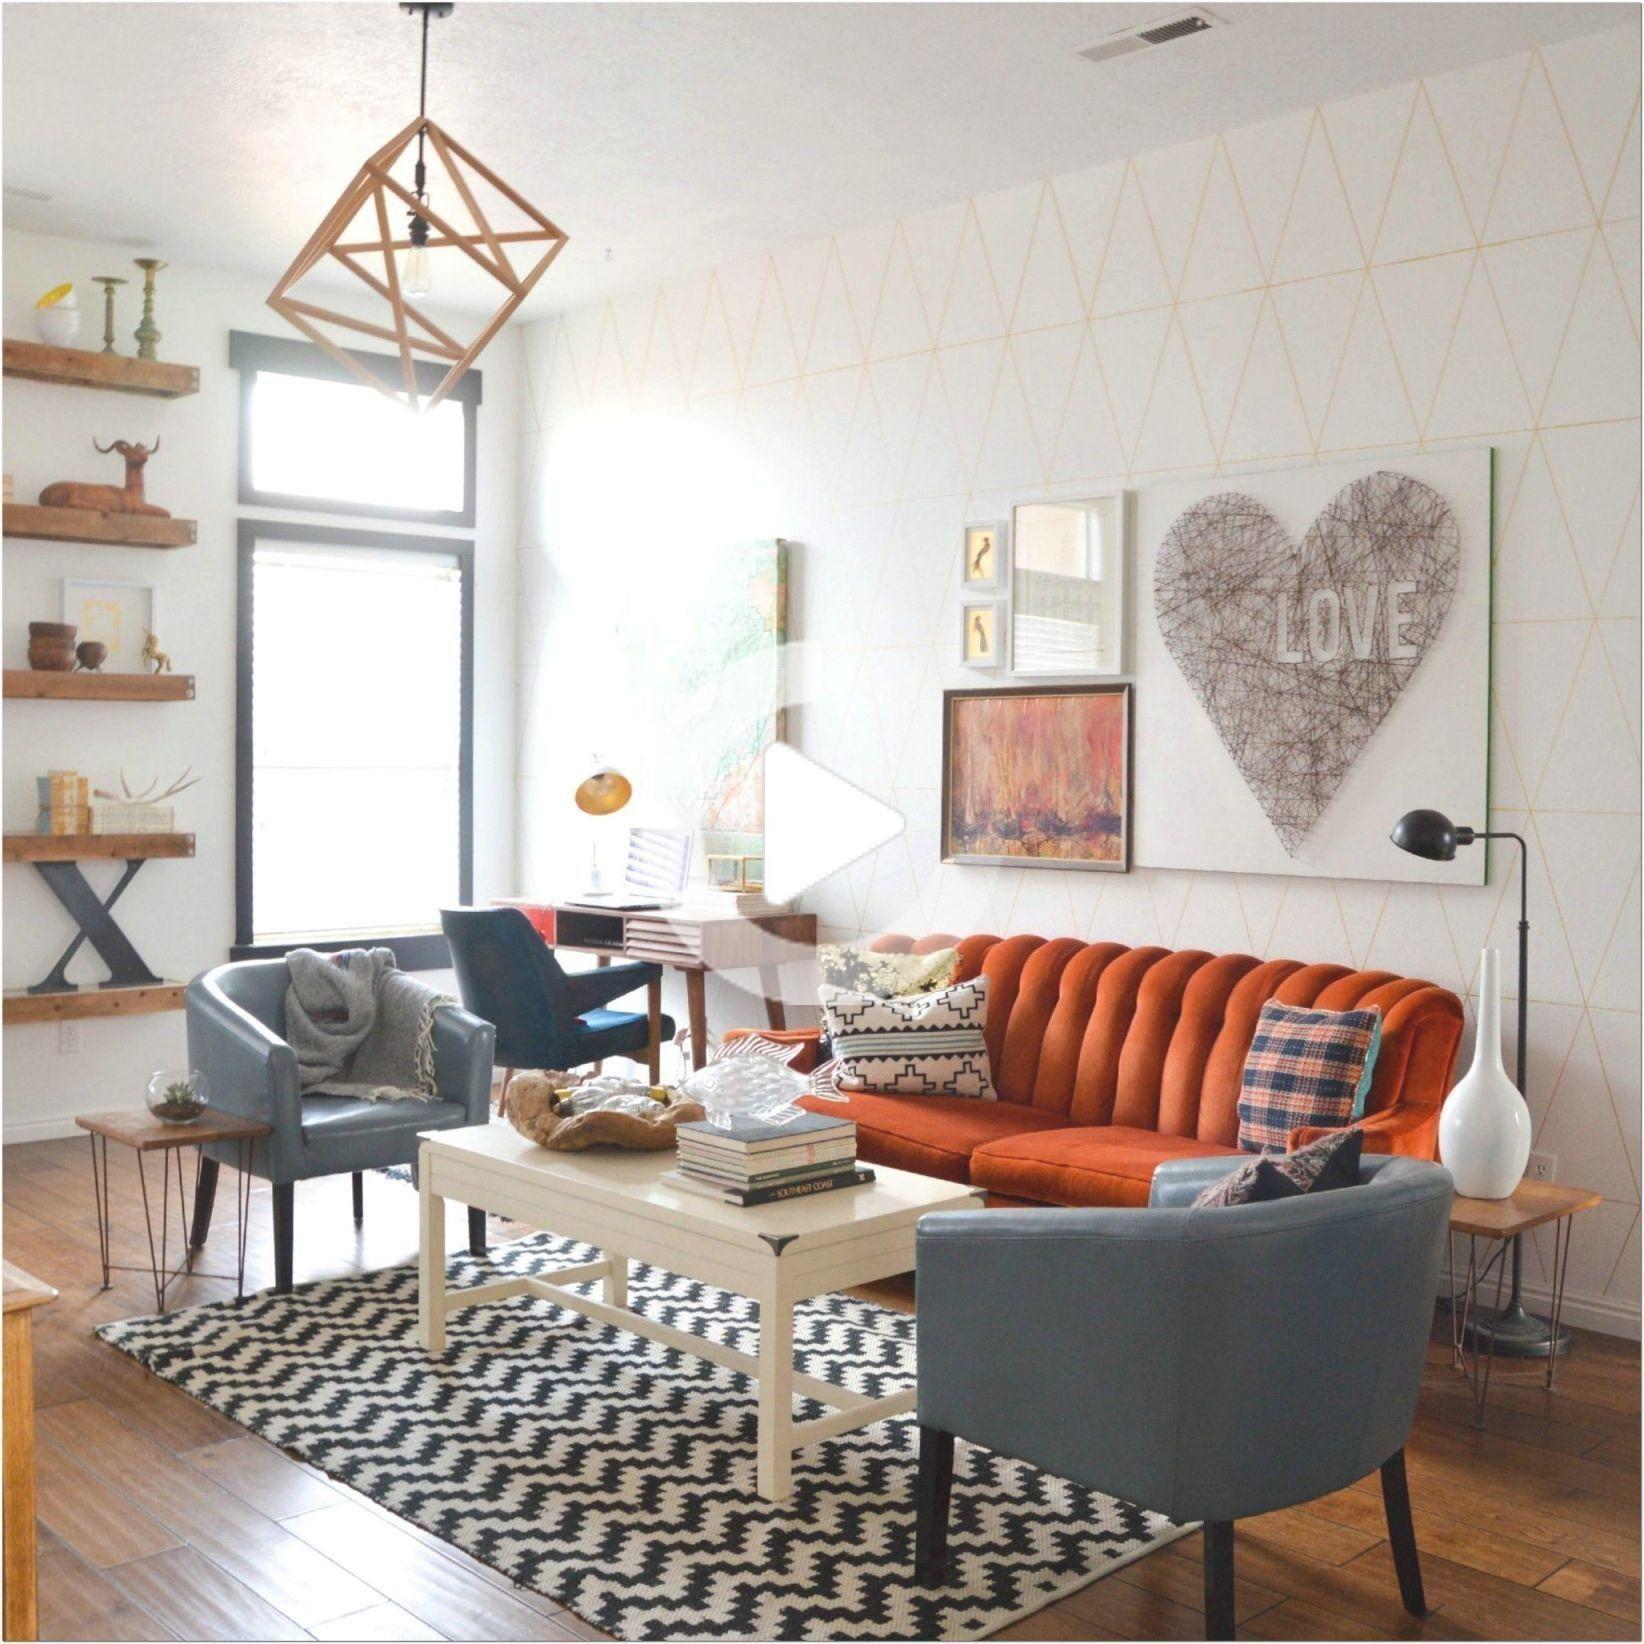 Pin On Marlee Padberg Ideas Vintage Living Room Decor Vintage Living Room Living Room Decor Vintage living room design